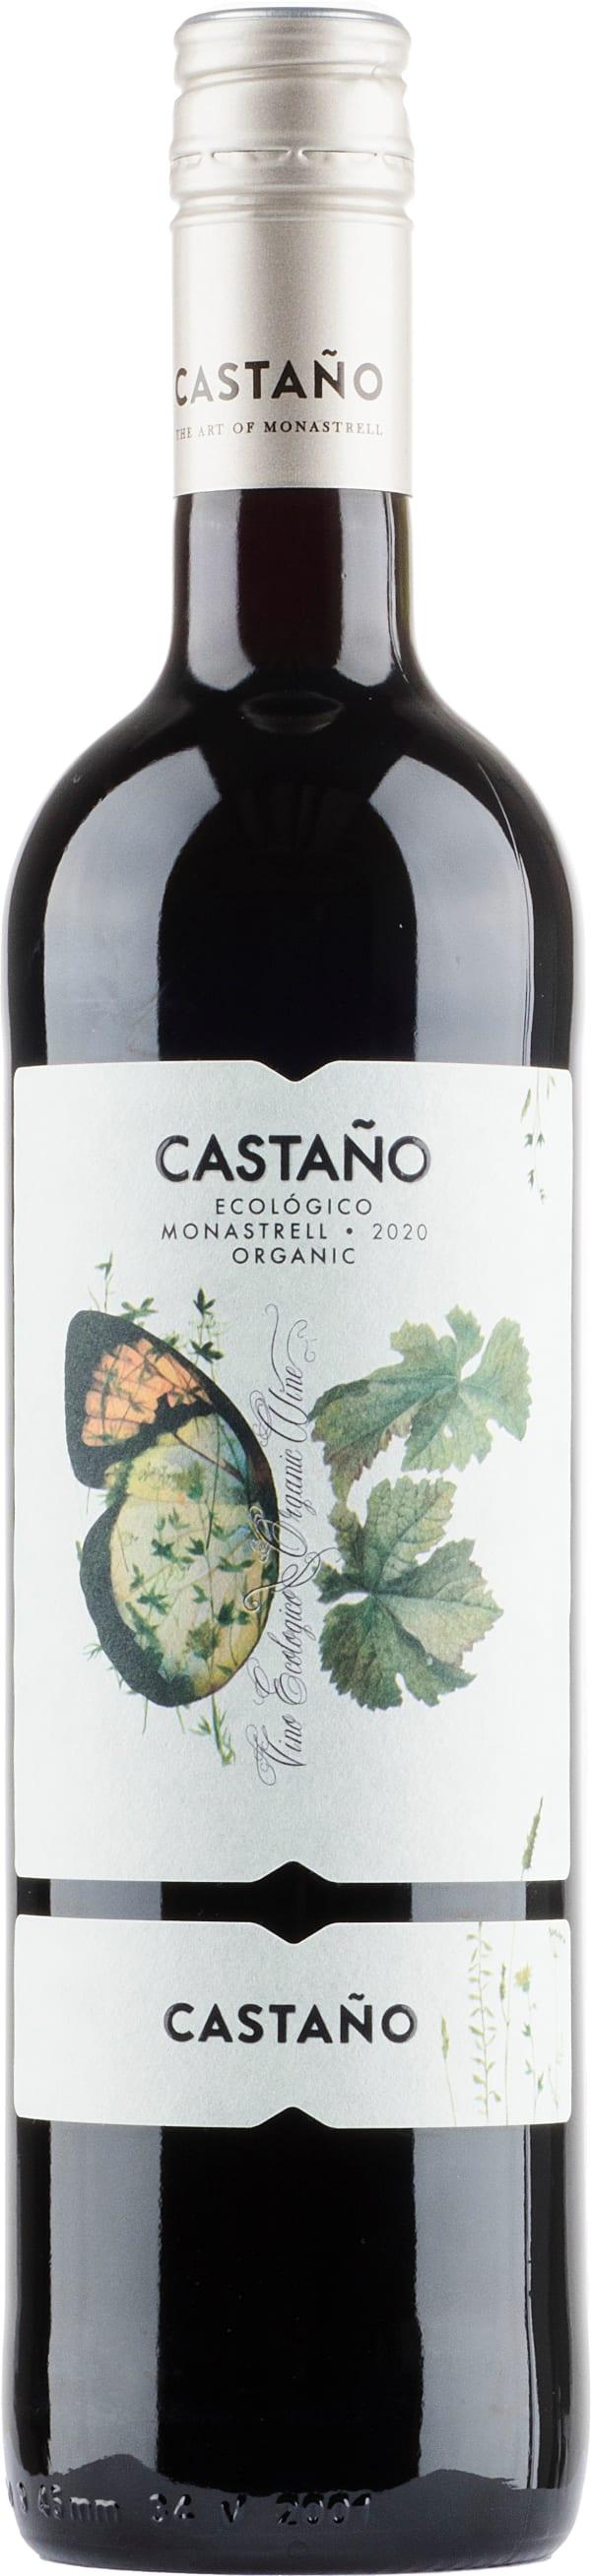 Castano Ecologico Monastrell 2019